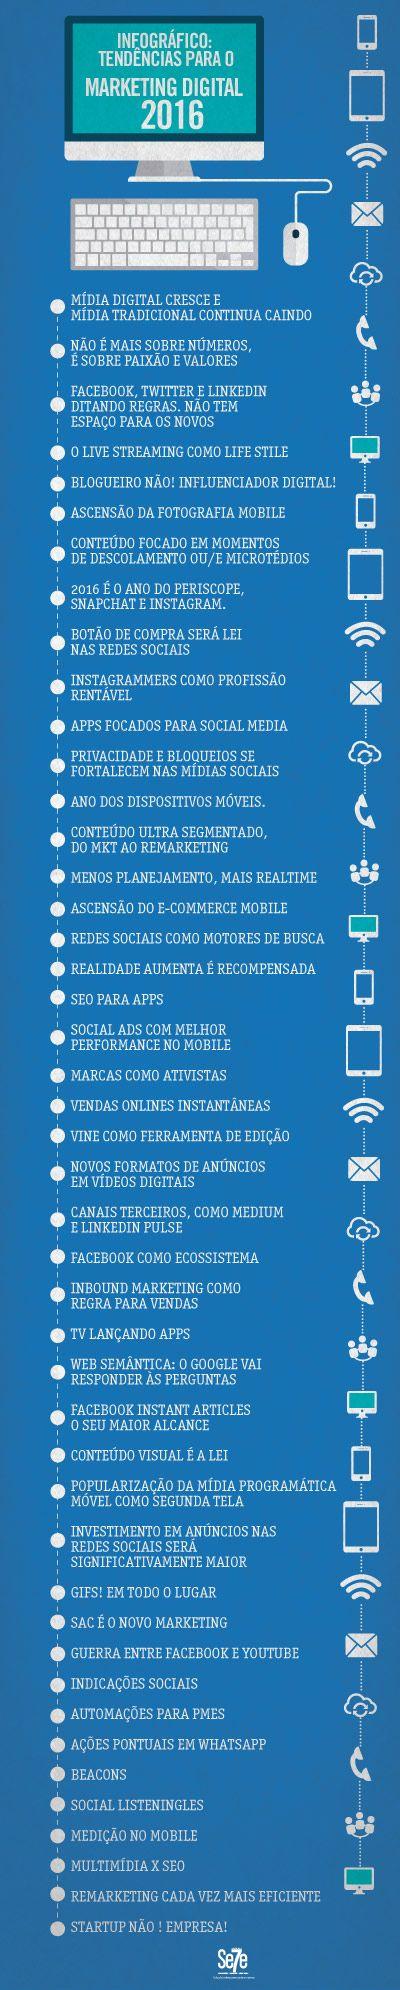 Tendências para o Marketing Digital 2016 – Infográfico